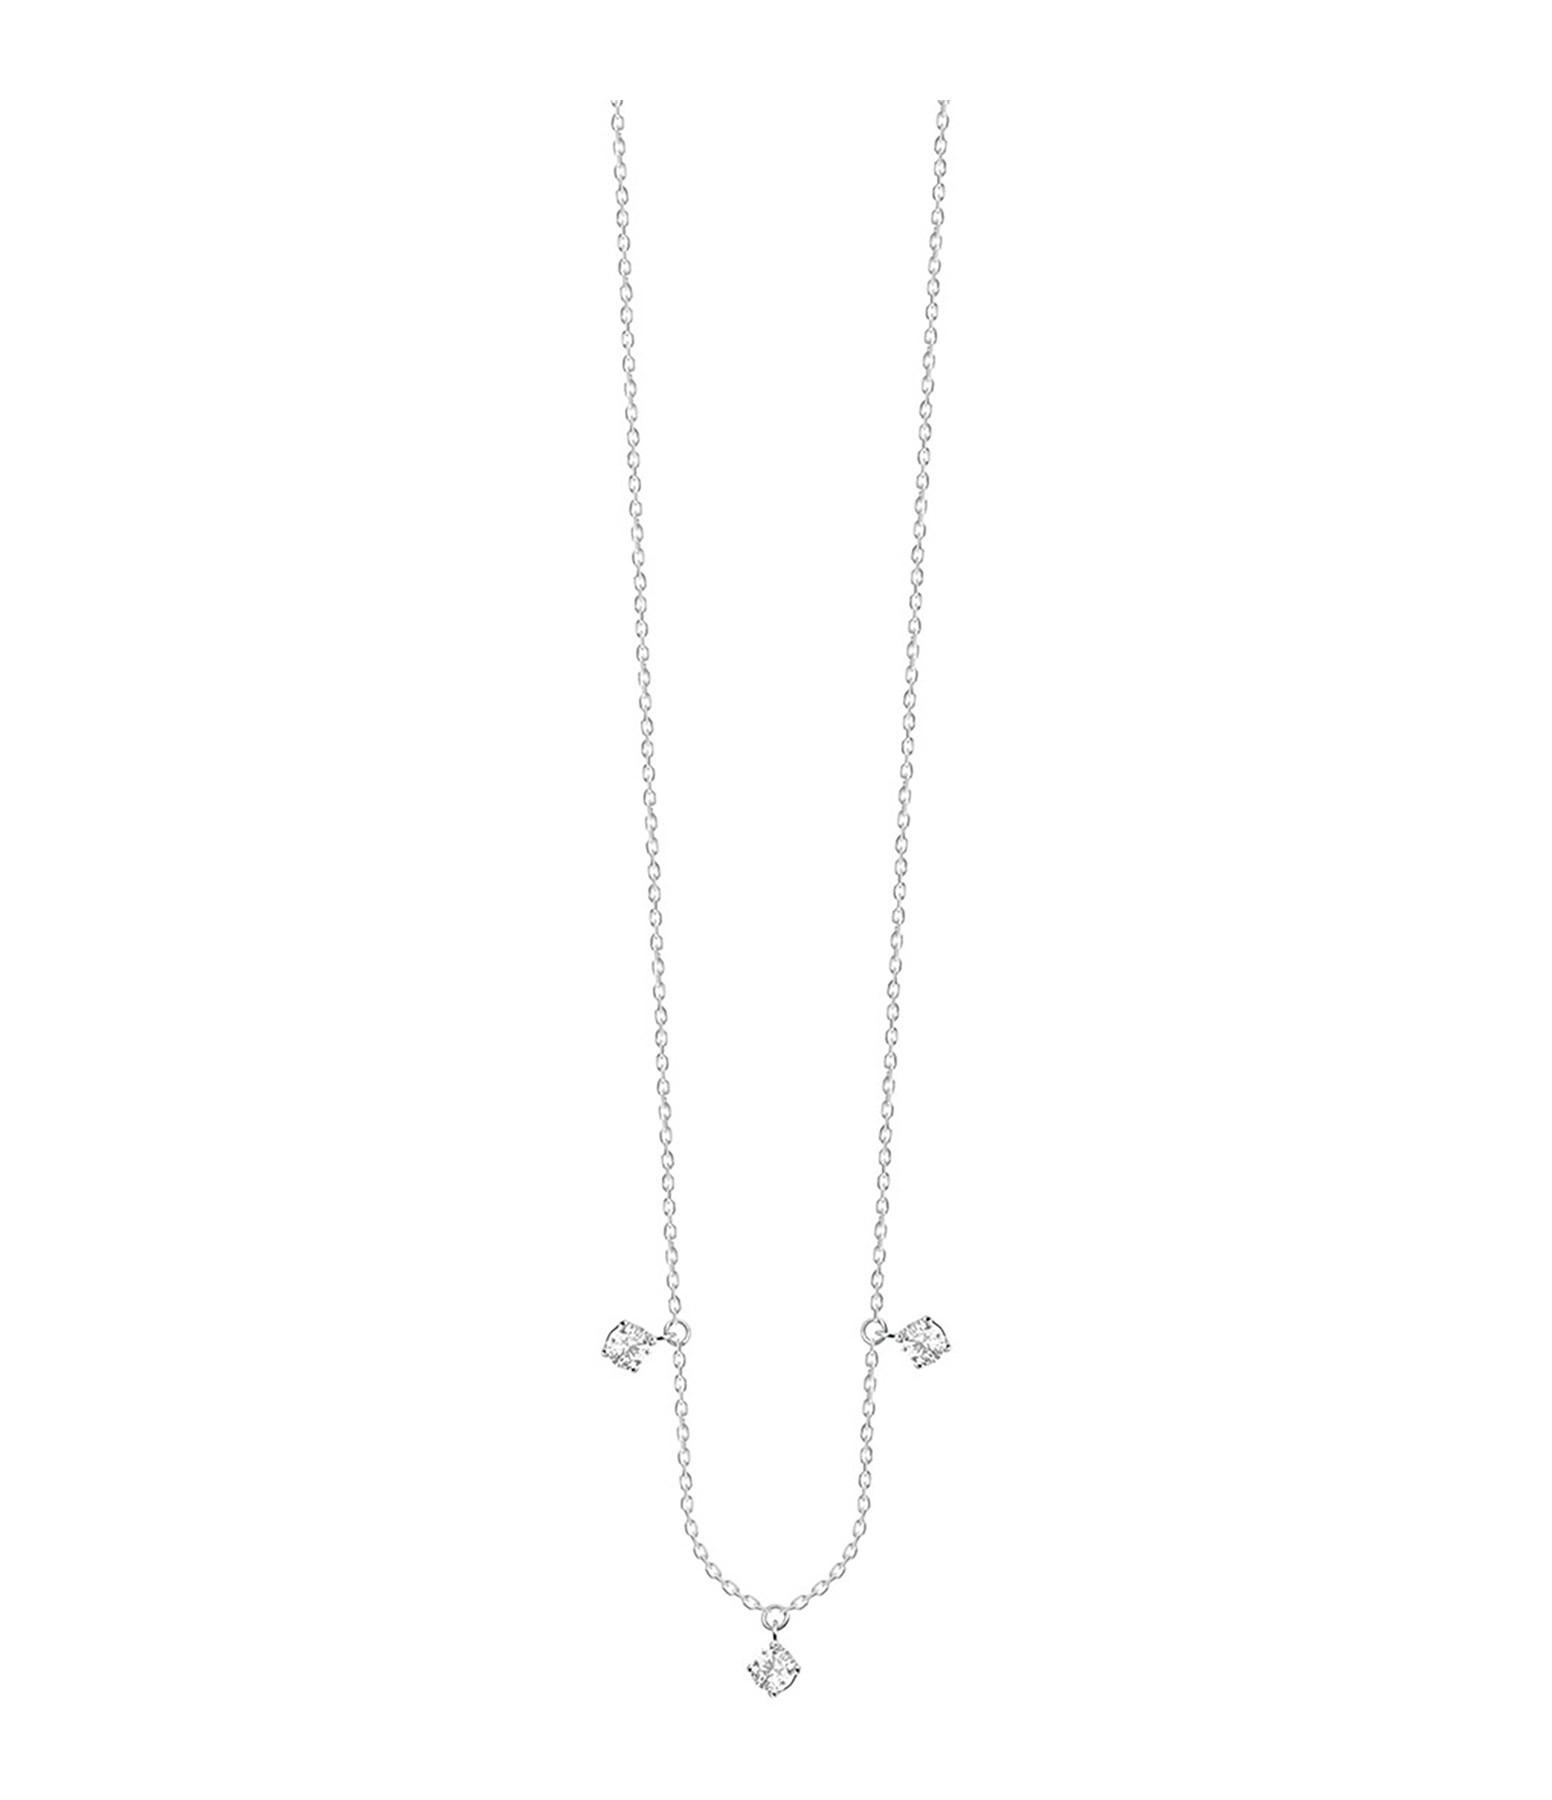 VANRYCKE - Collier Stardust Or Blanc 3 Diamant